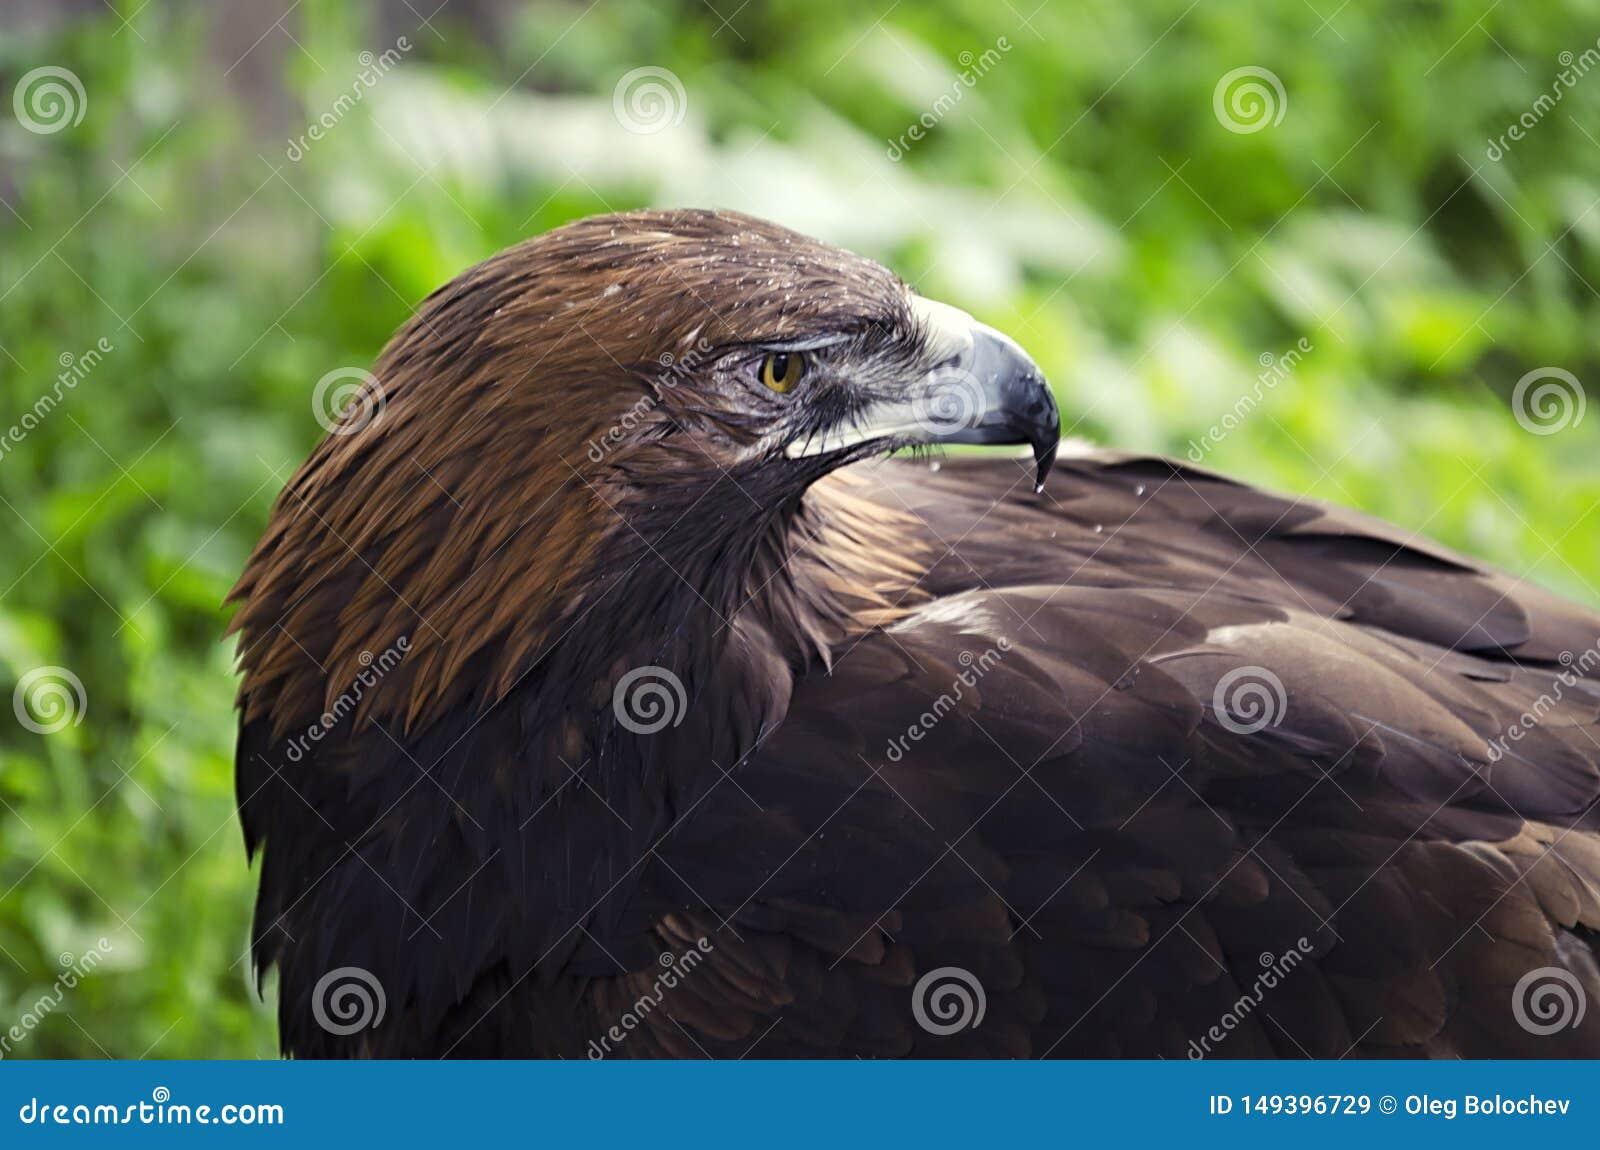 The sight of an eagle, a bird of prey on the earth, birds in captivity, an eagle close up